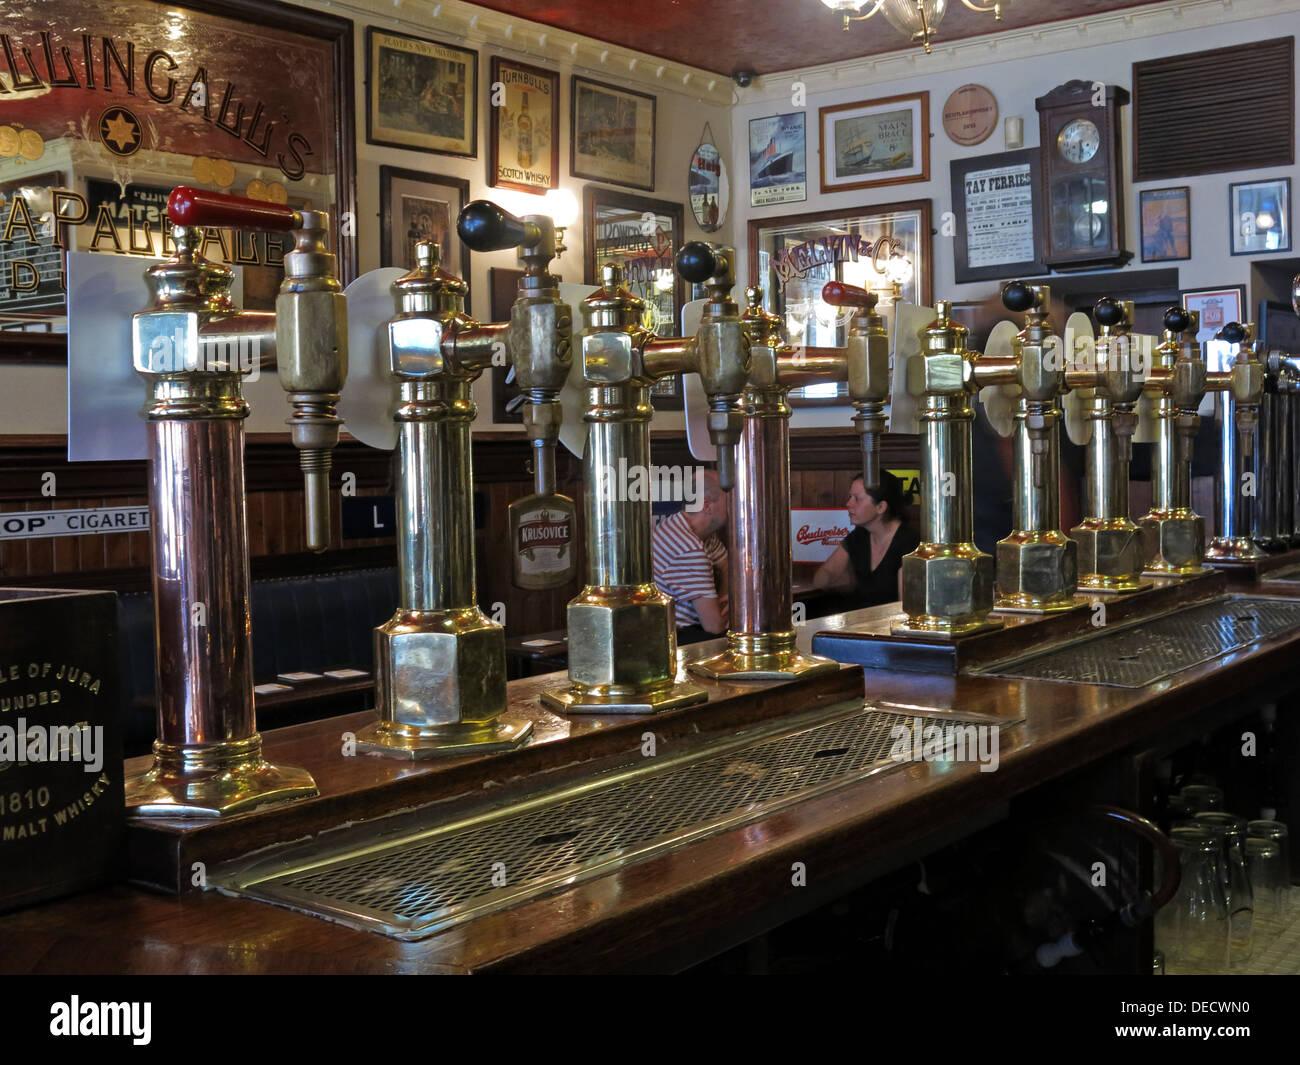 Traditional Ale pumps at the Bow Bar, Victoria Street, Edinburgh, Scotland, UK - Stock Image